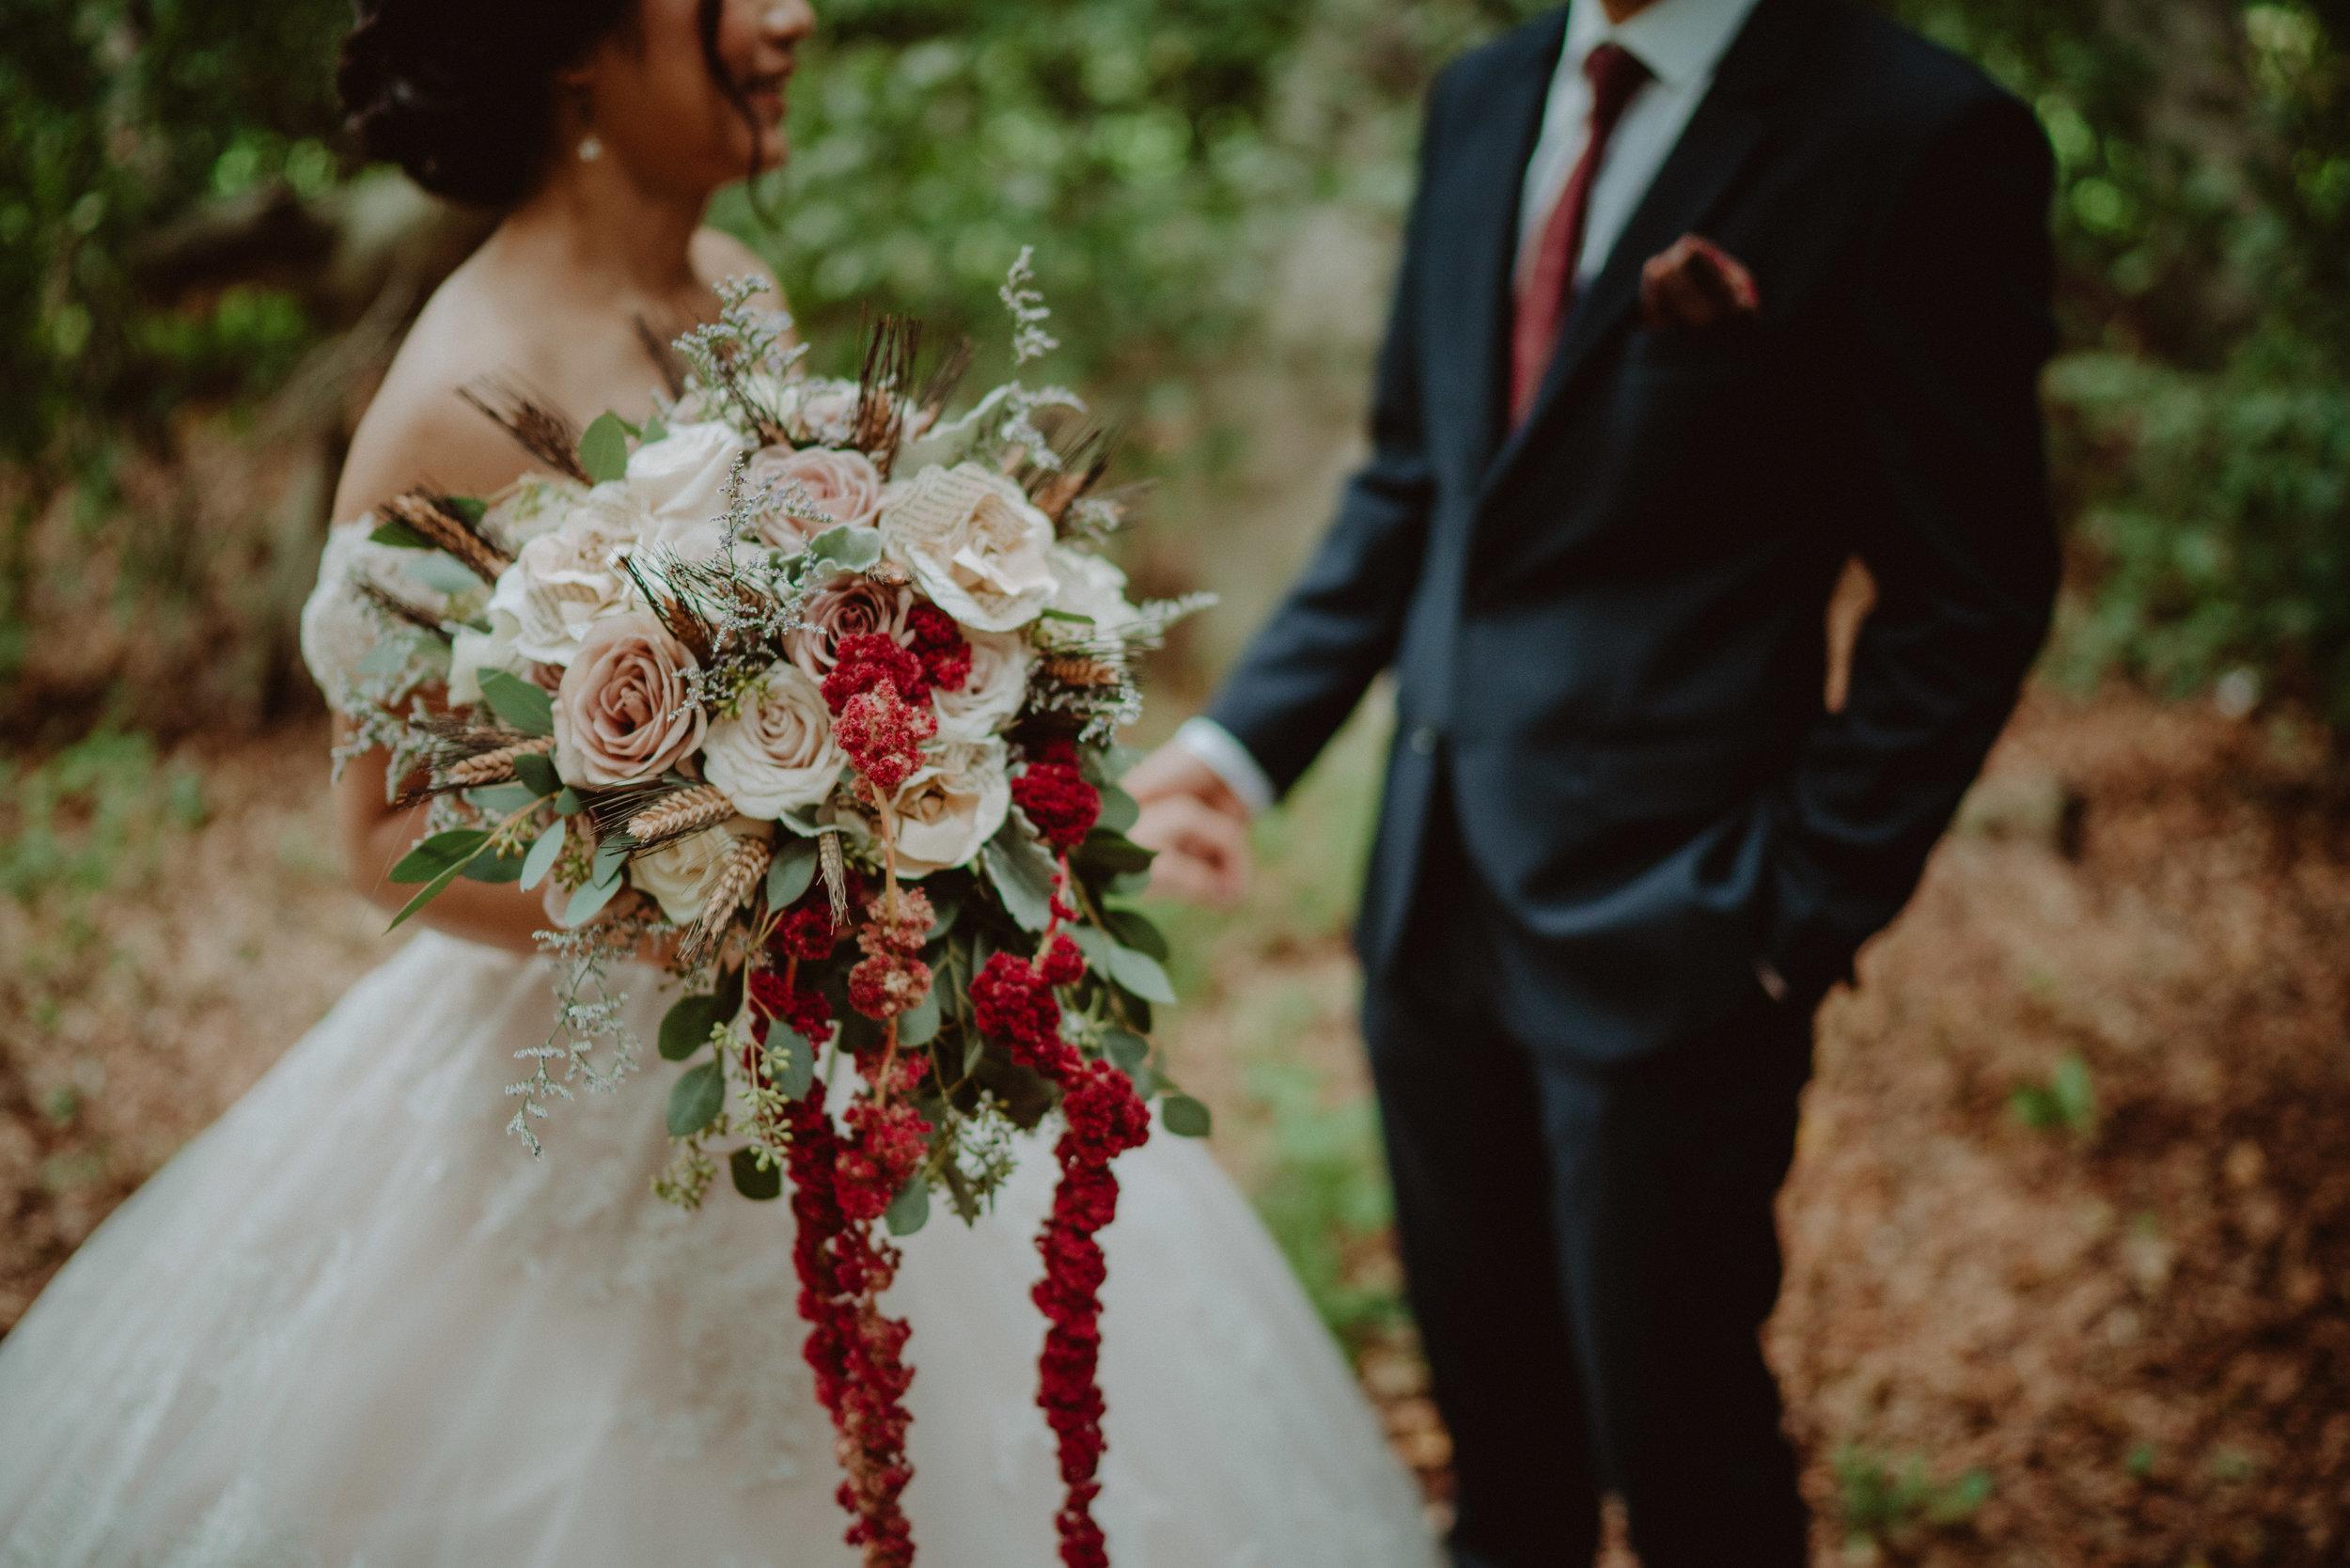 Irene-and-Jae-2019_Brooklyn_Wedding_Photographer_Chellise_Michael_Photography--40.jpg